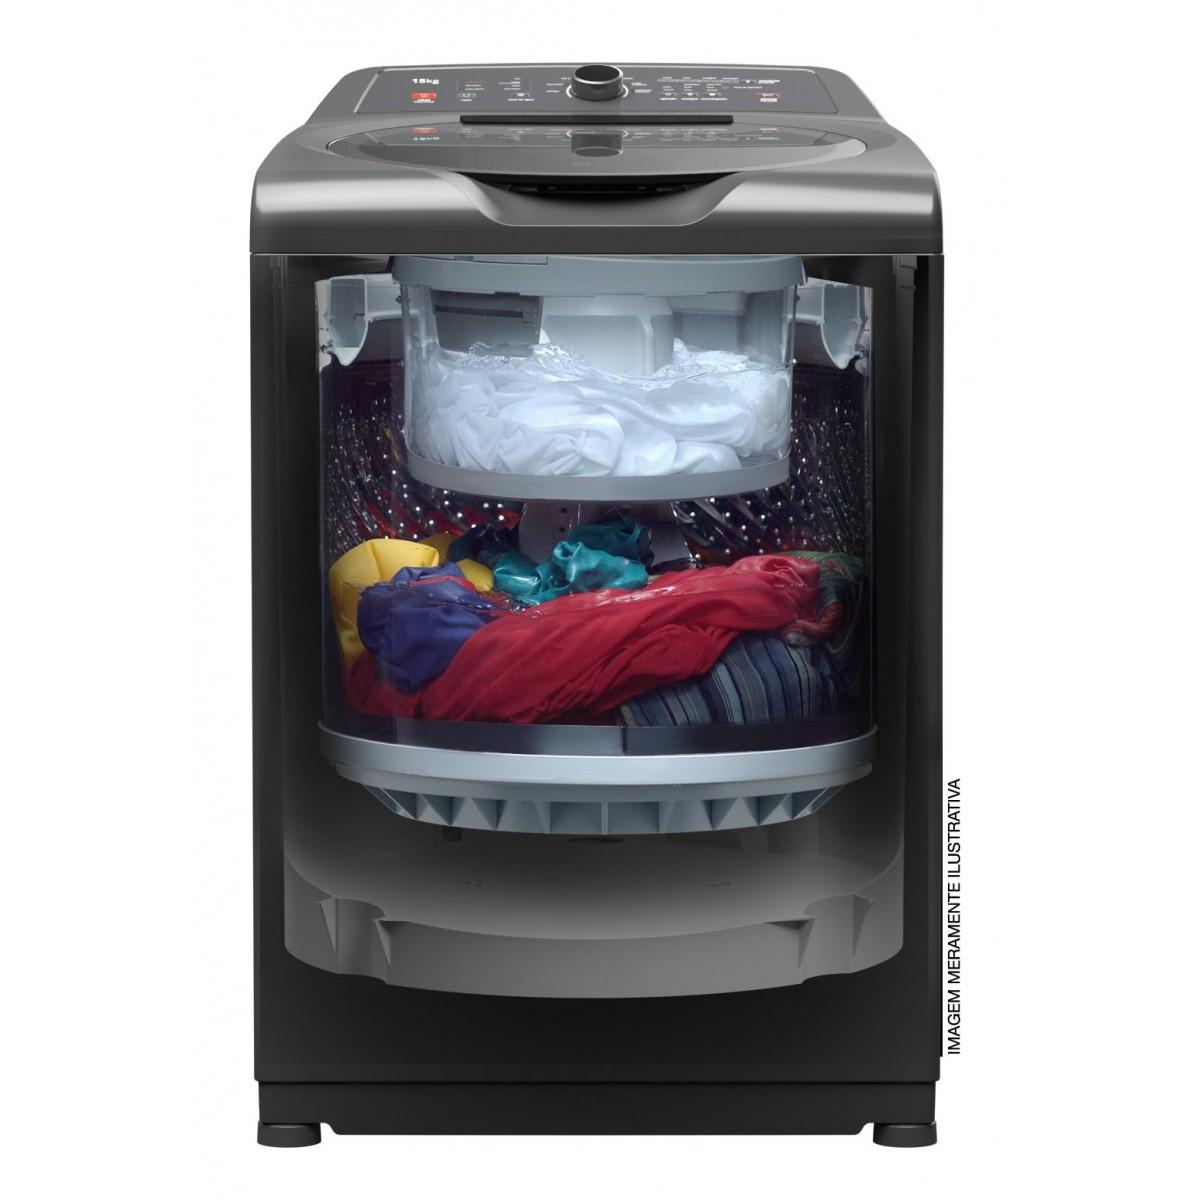 Lavadora Brastemp Dual Wash 15Kg - BWD15A9